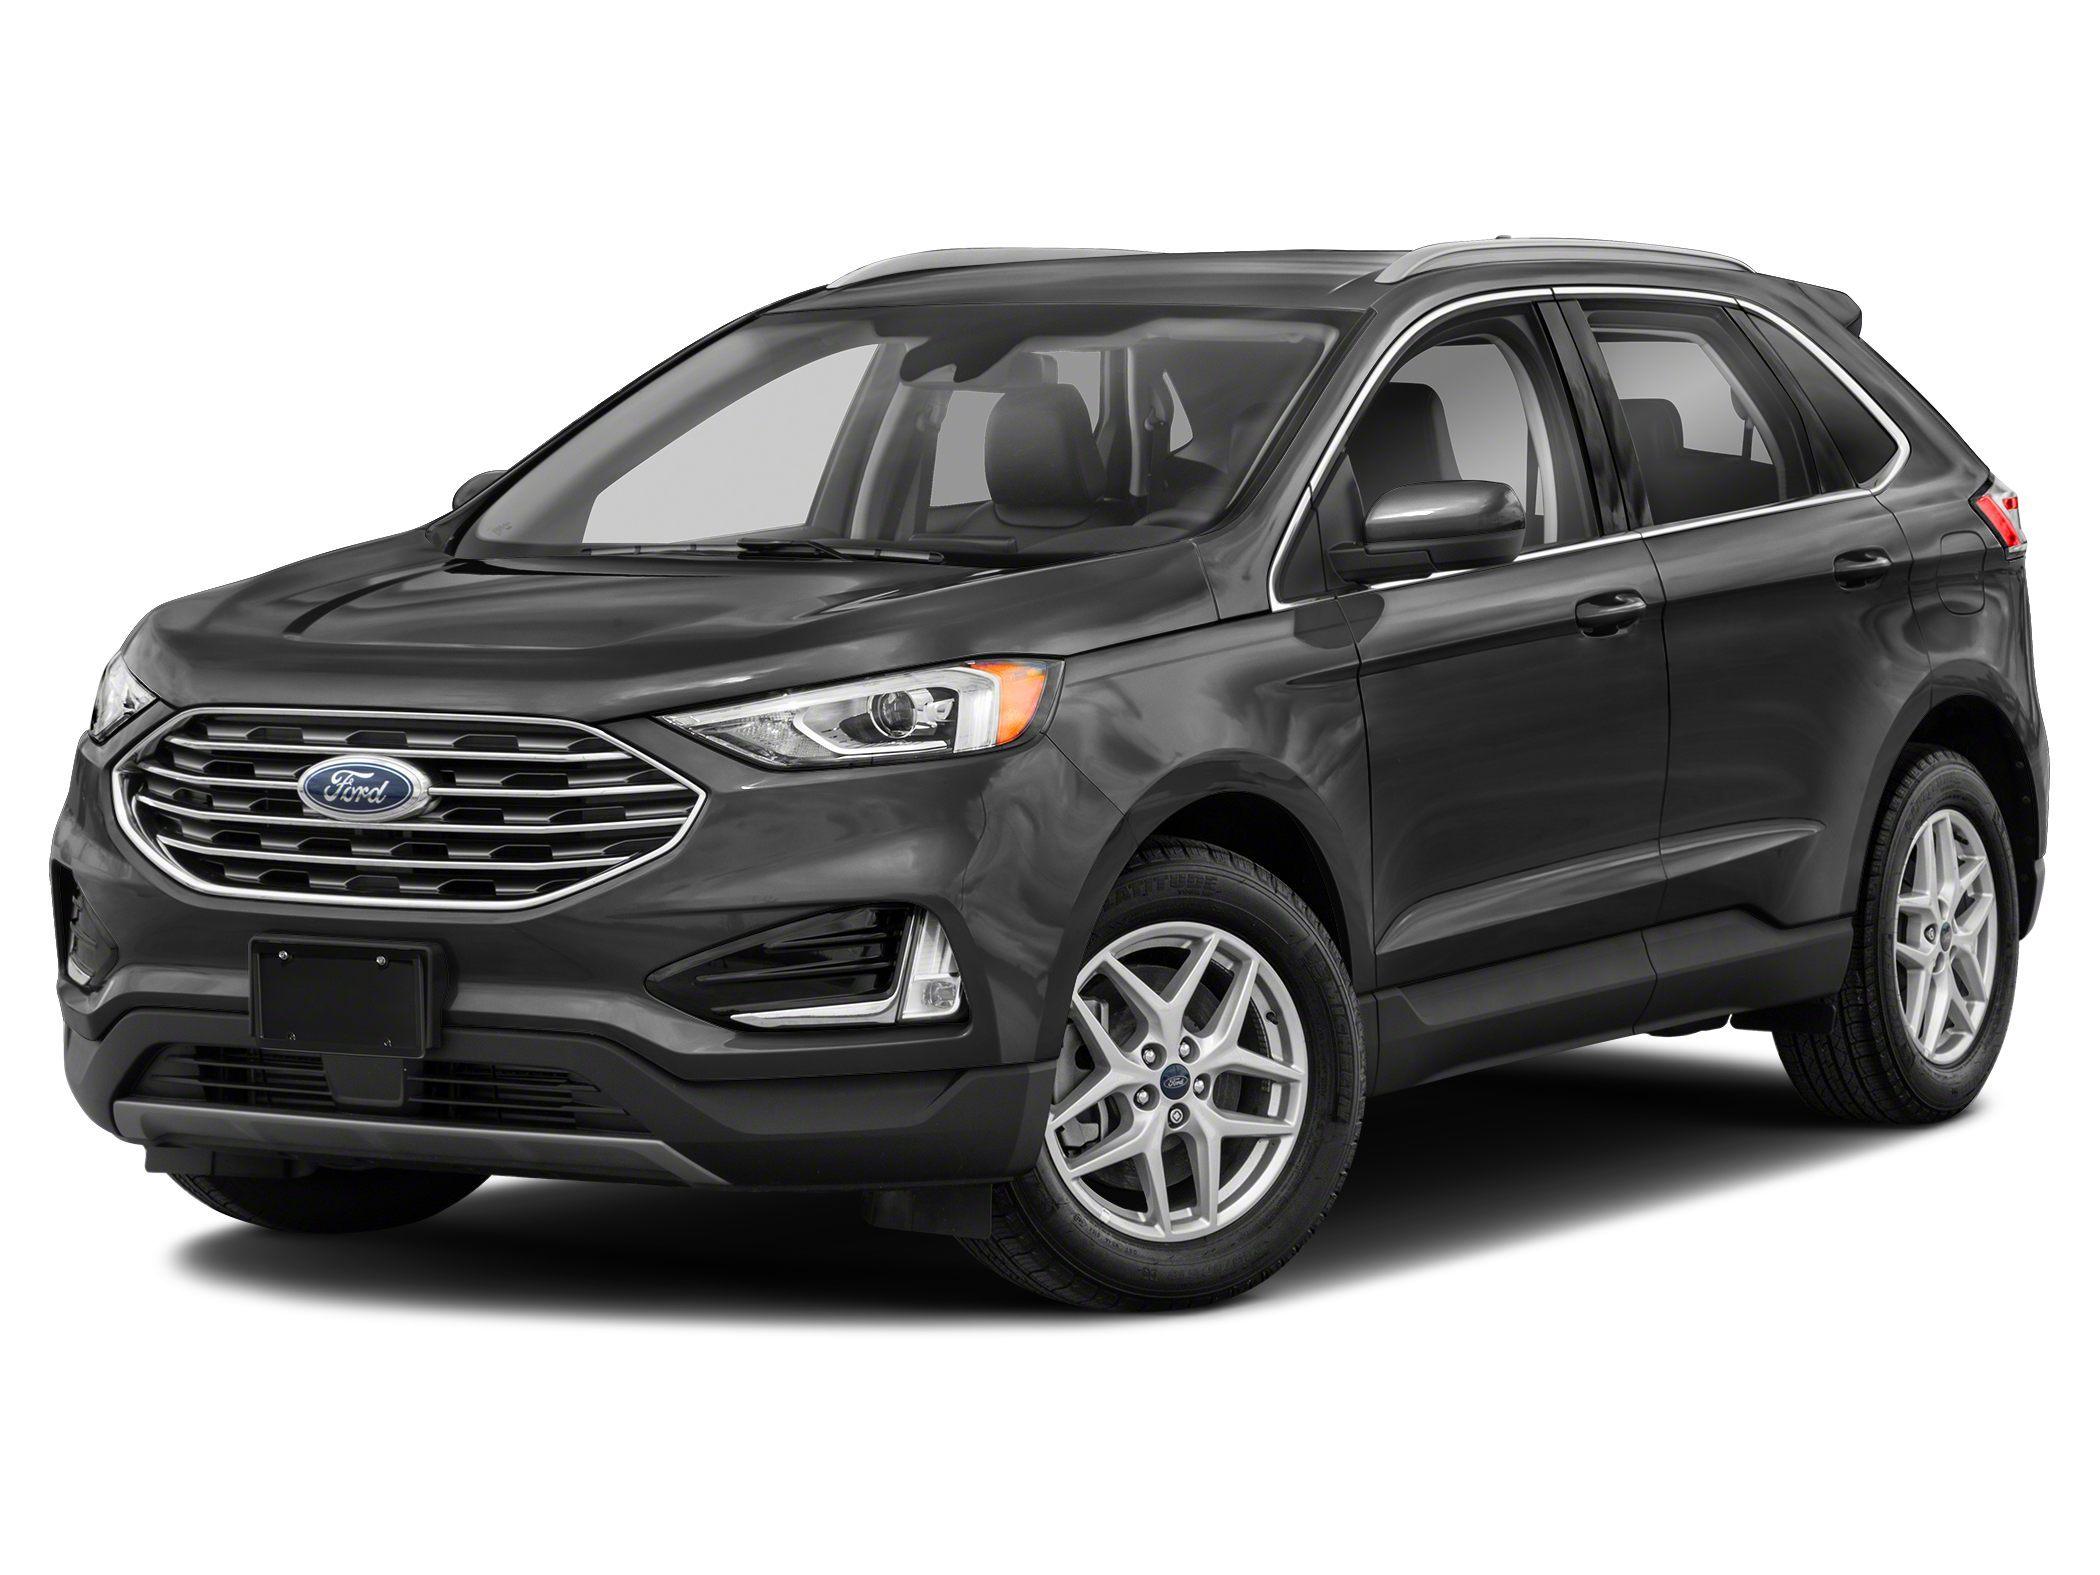 2021 Ford Edge SUV